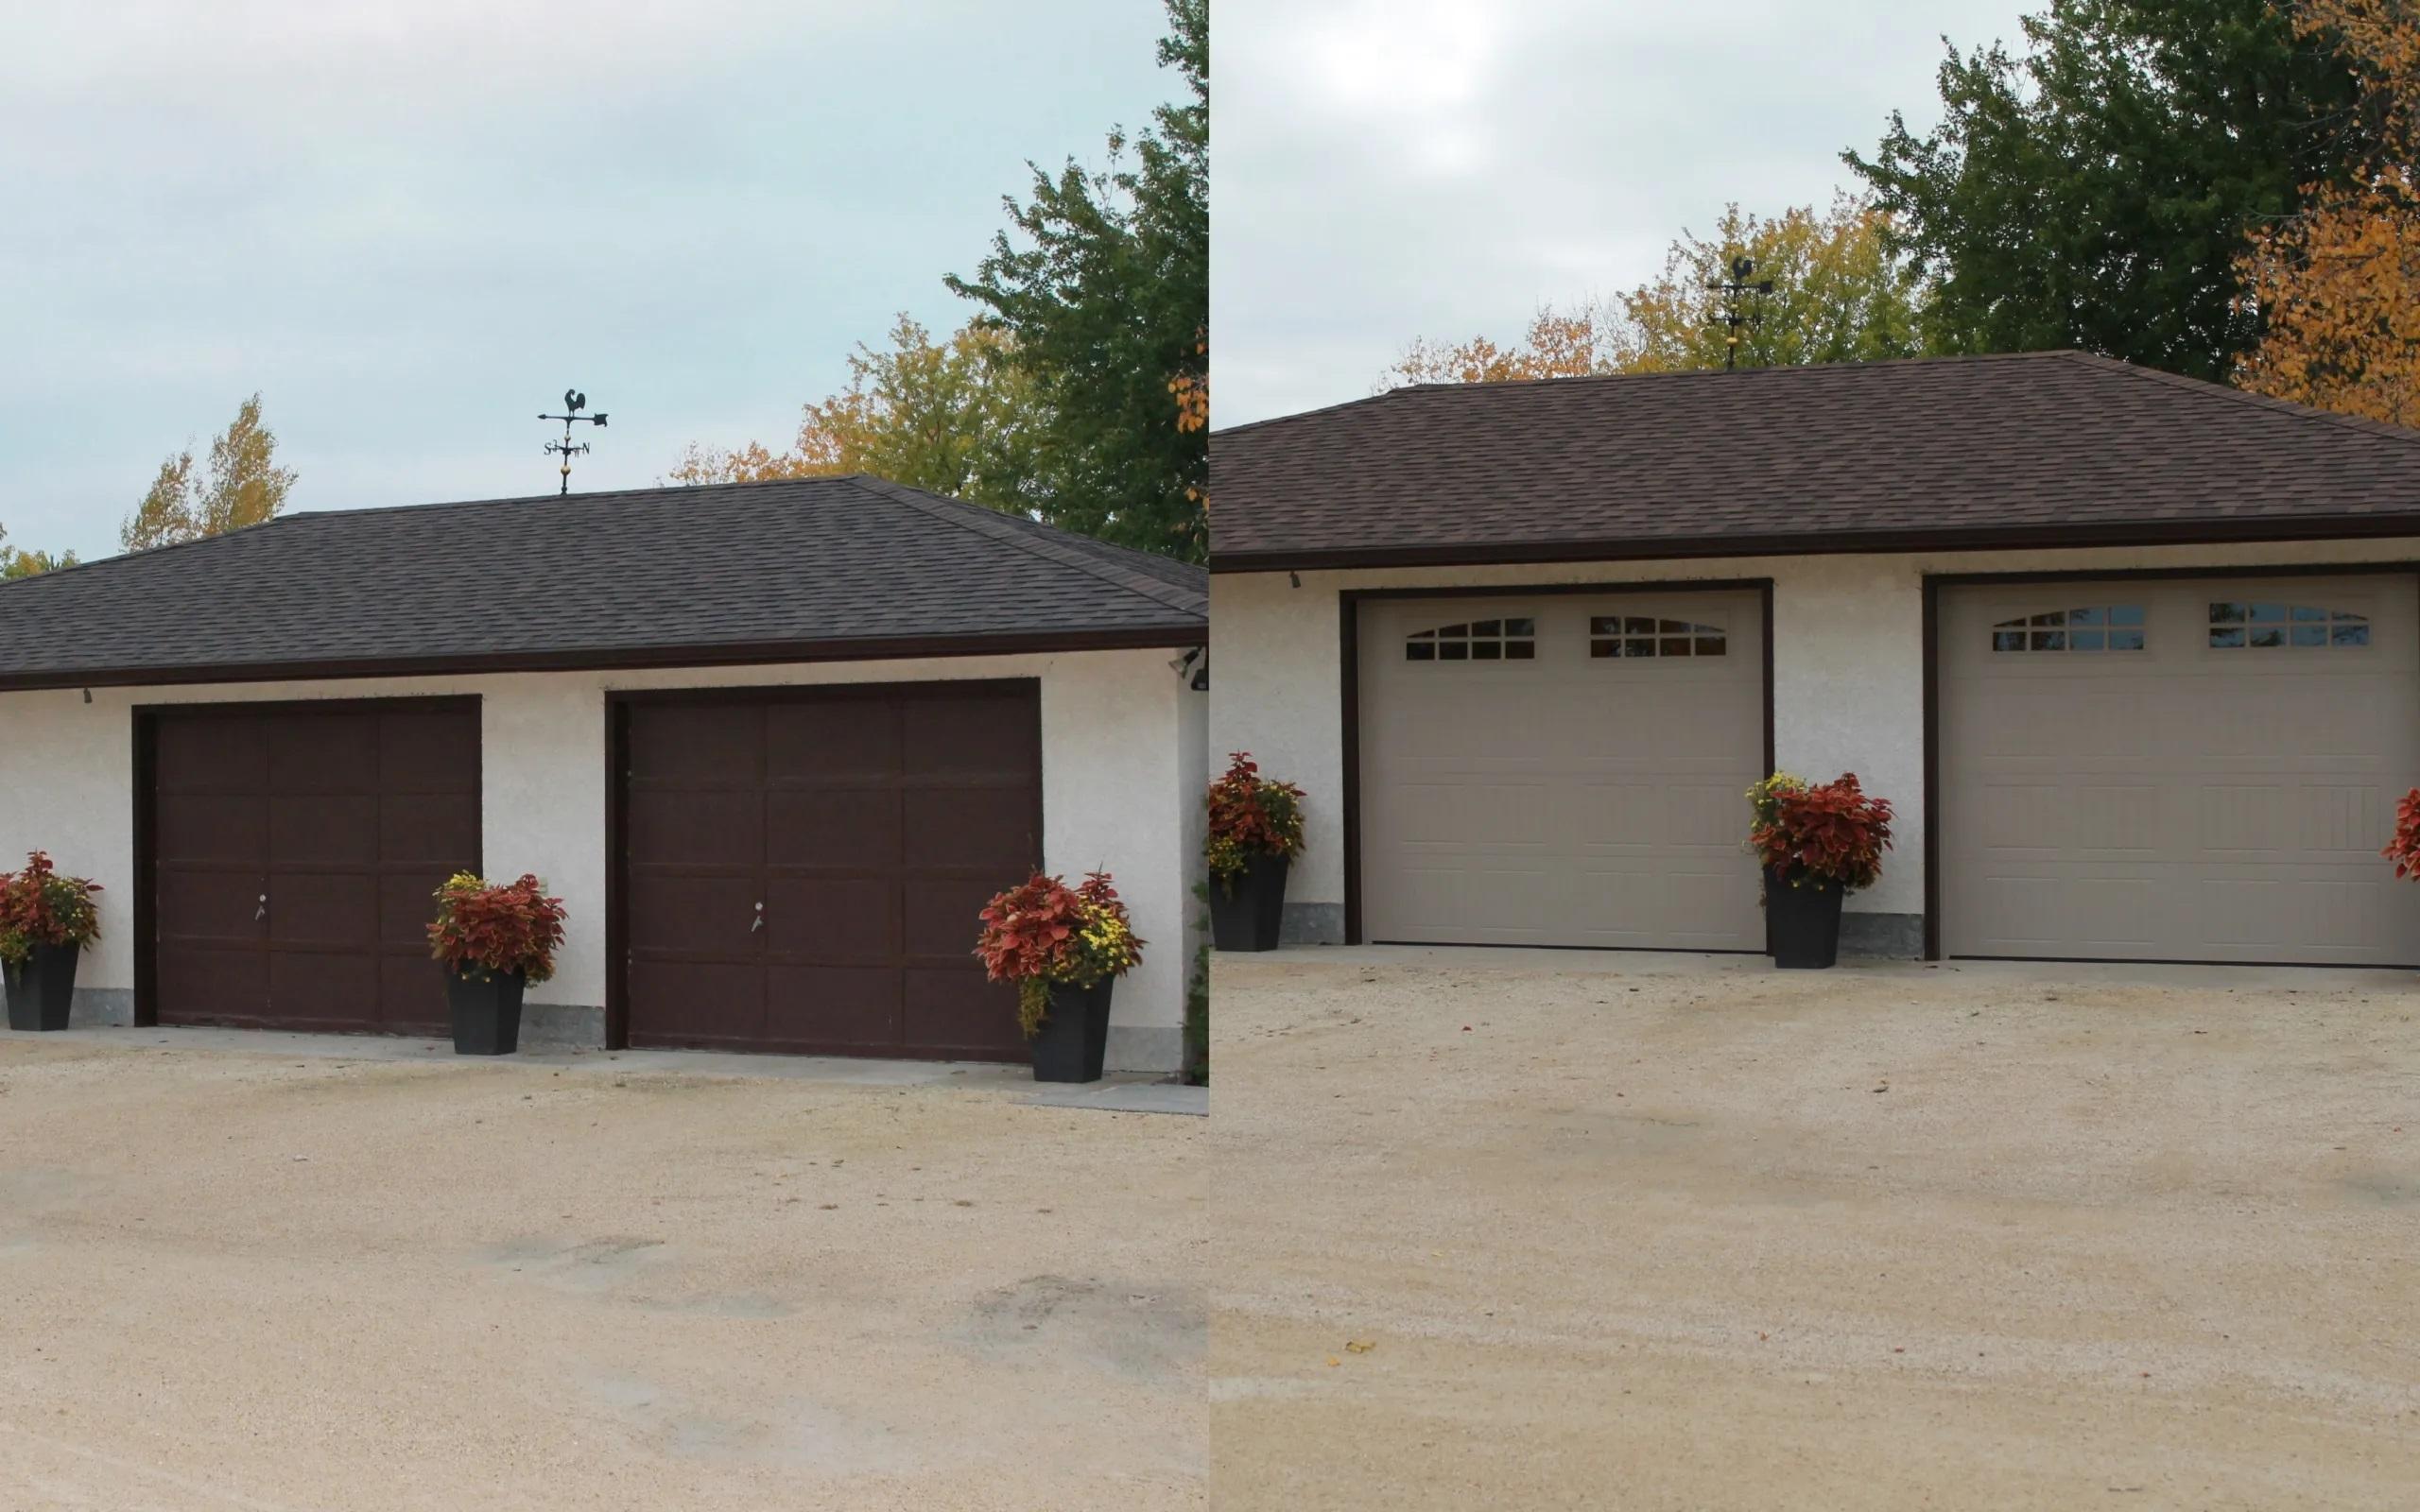 Why you should choose a Steel-Craft garage door